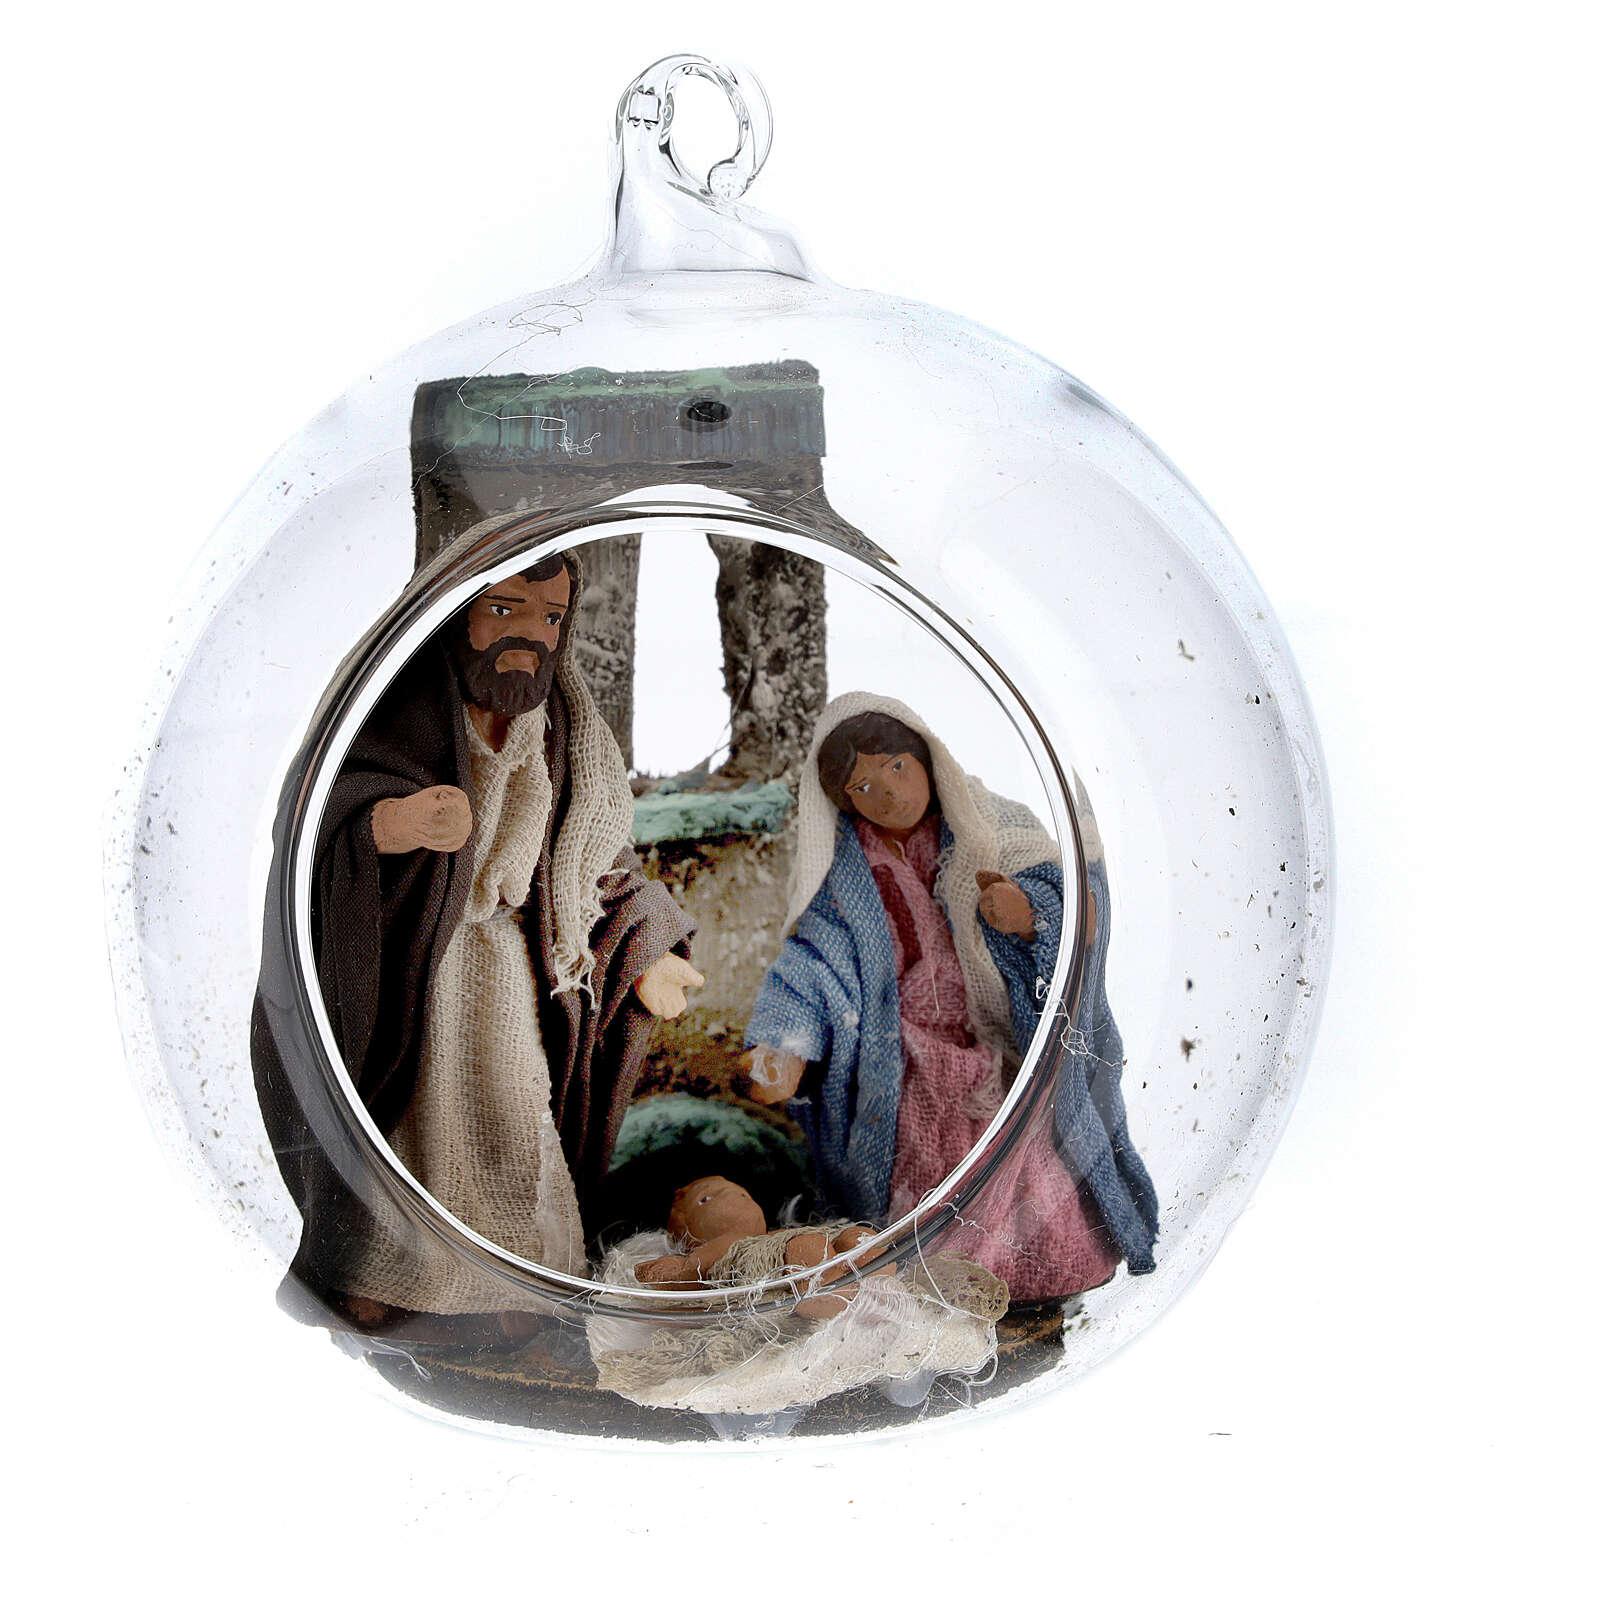 Holy Family in glass ball Neapolitan nativity scene 7 cm 4